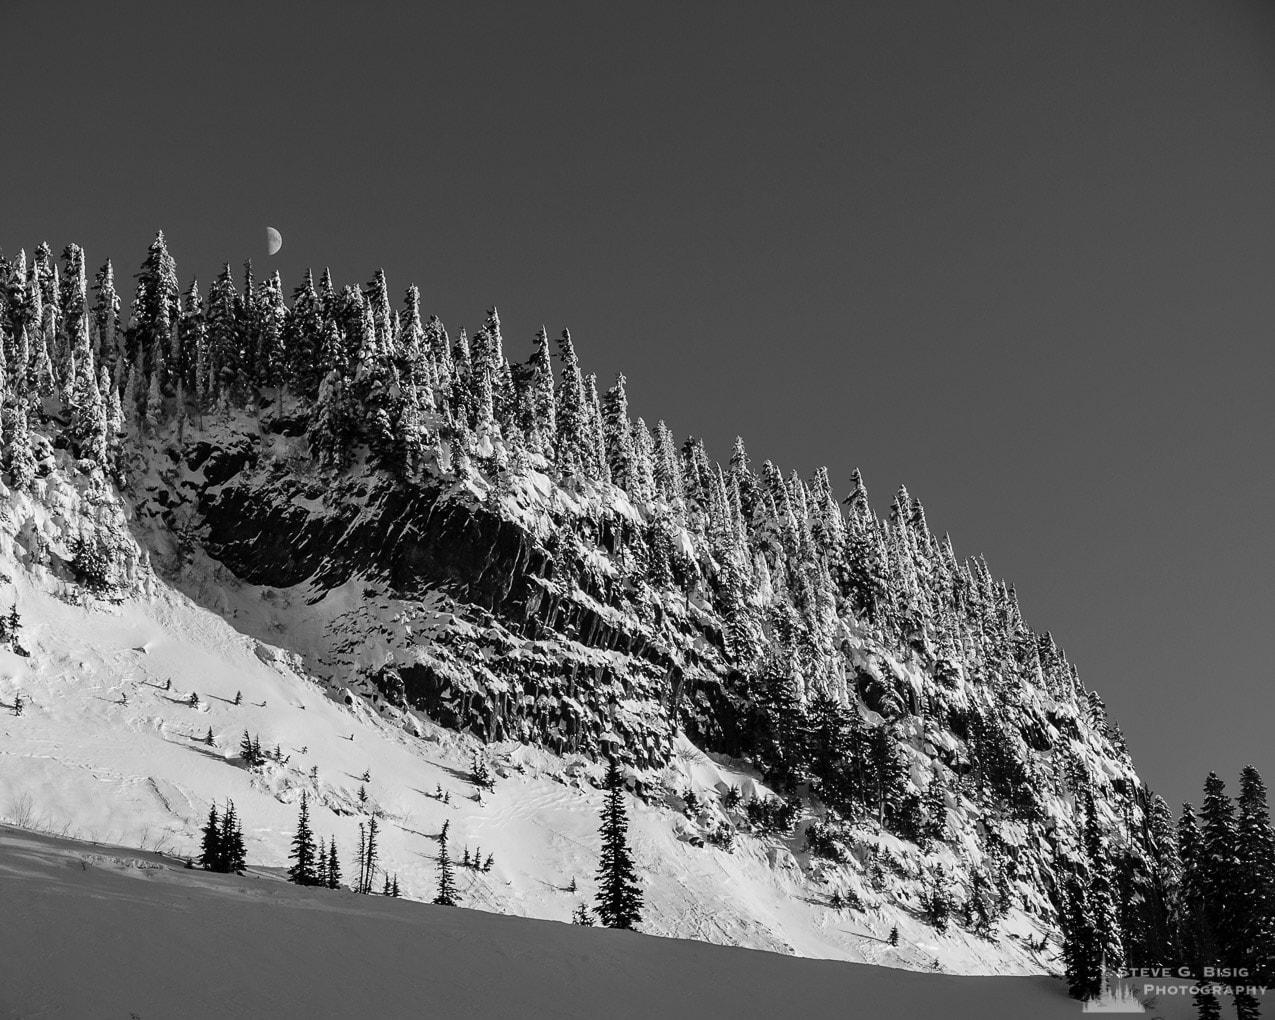 Winter, Inspiration Point, Mount Rainier, Washington, 2017